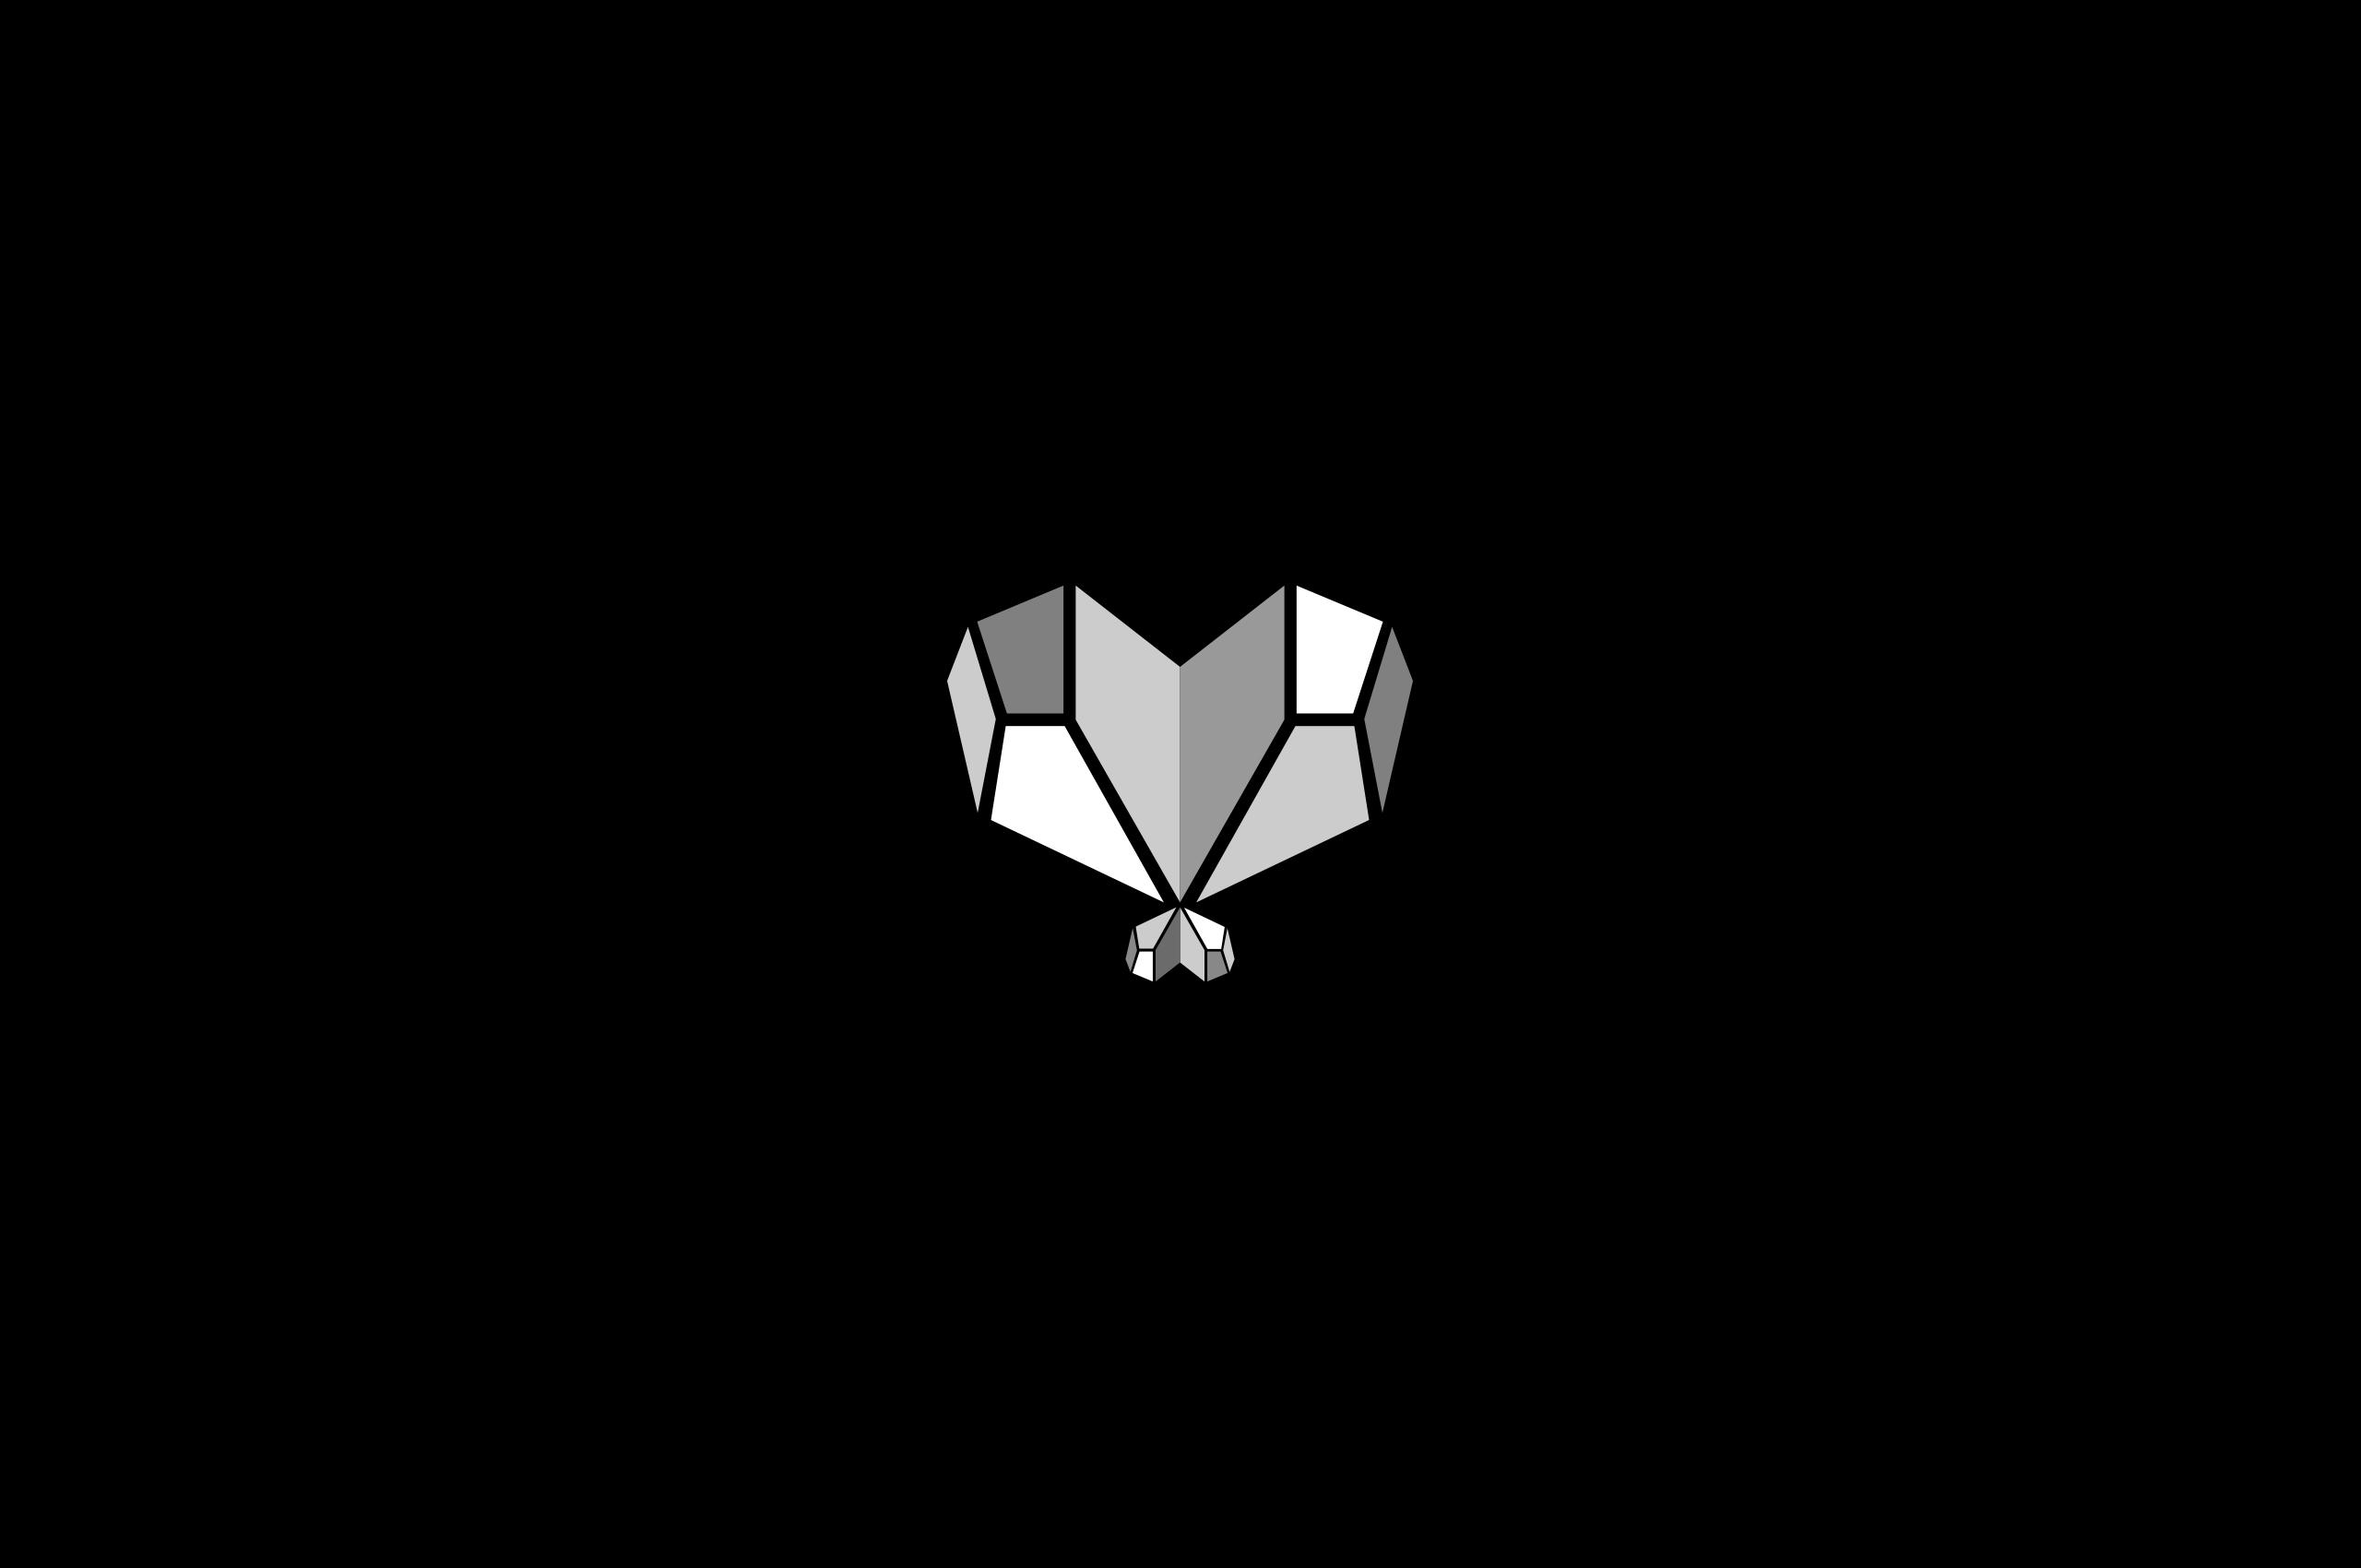 logo-5-black